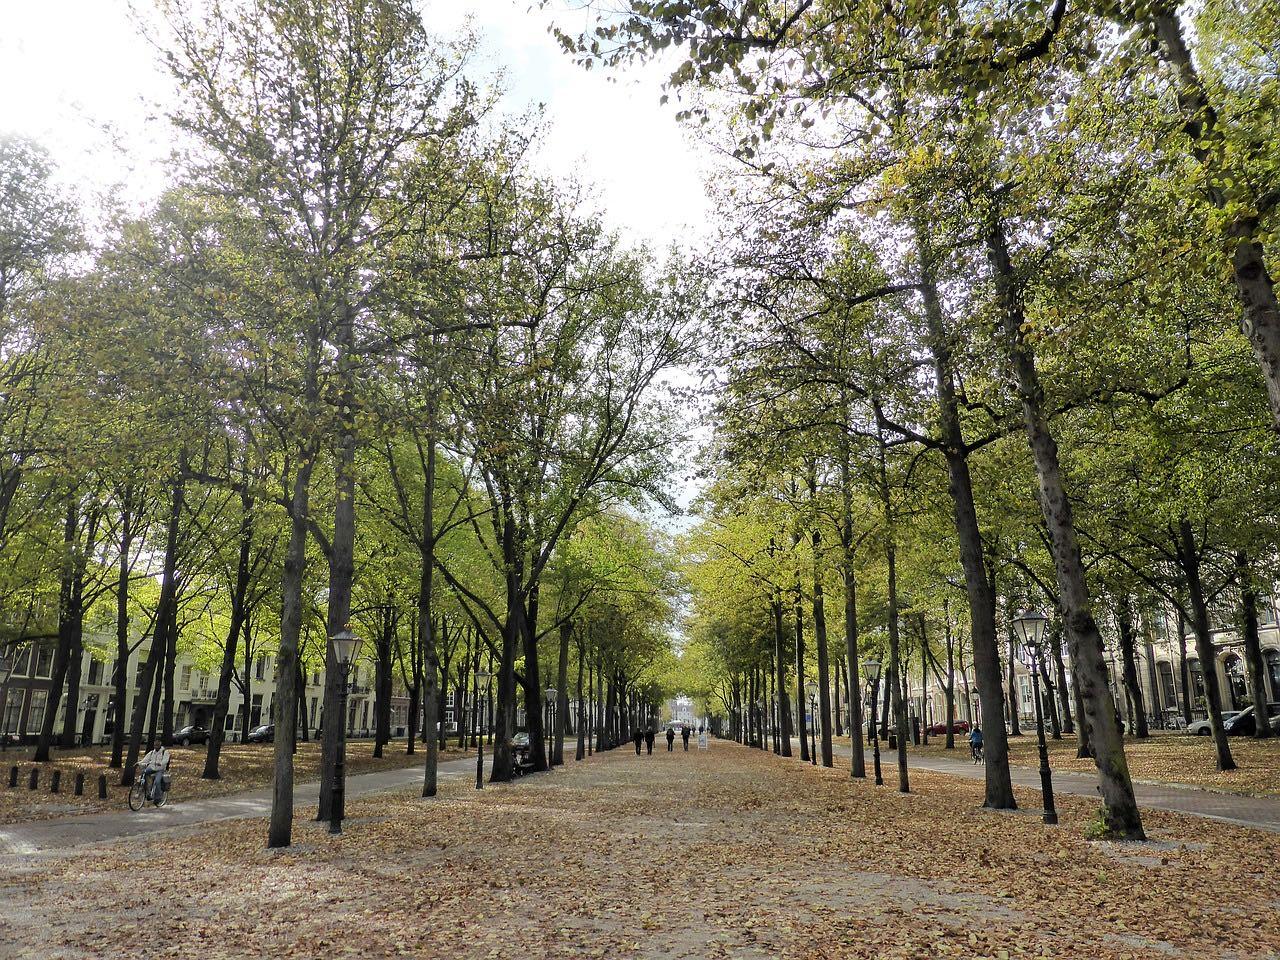 Koninklijke wandeling - Lange Voorhout